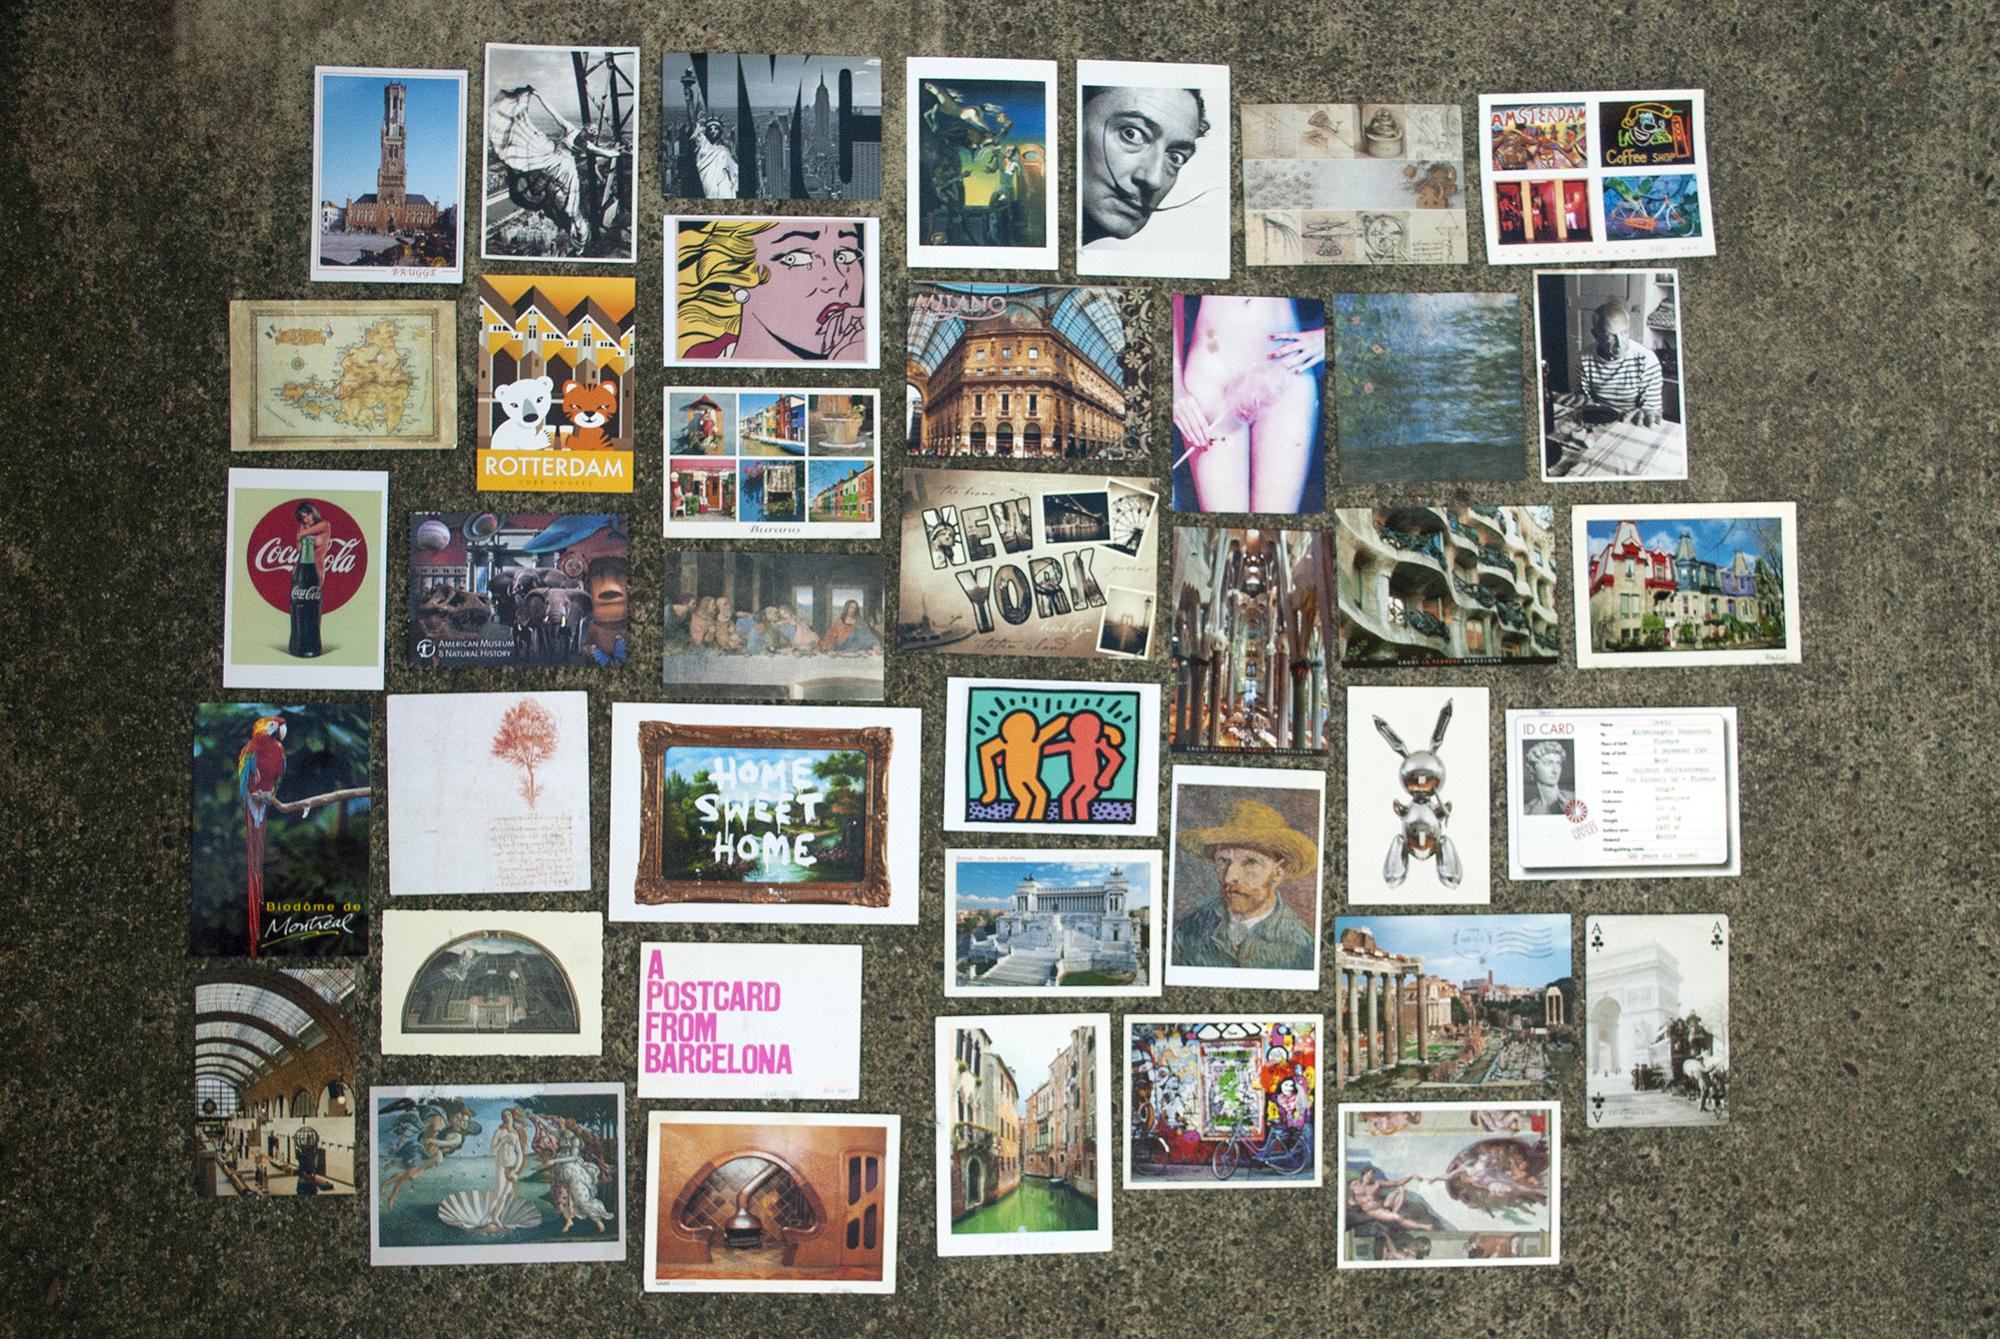 Postcards I've sent myself during my travels